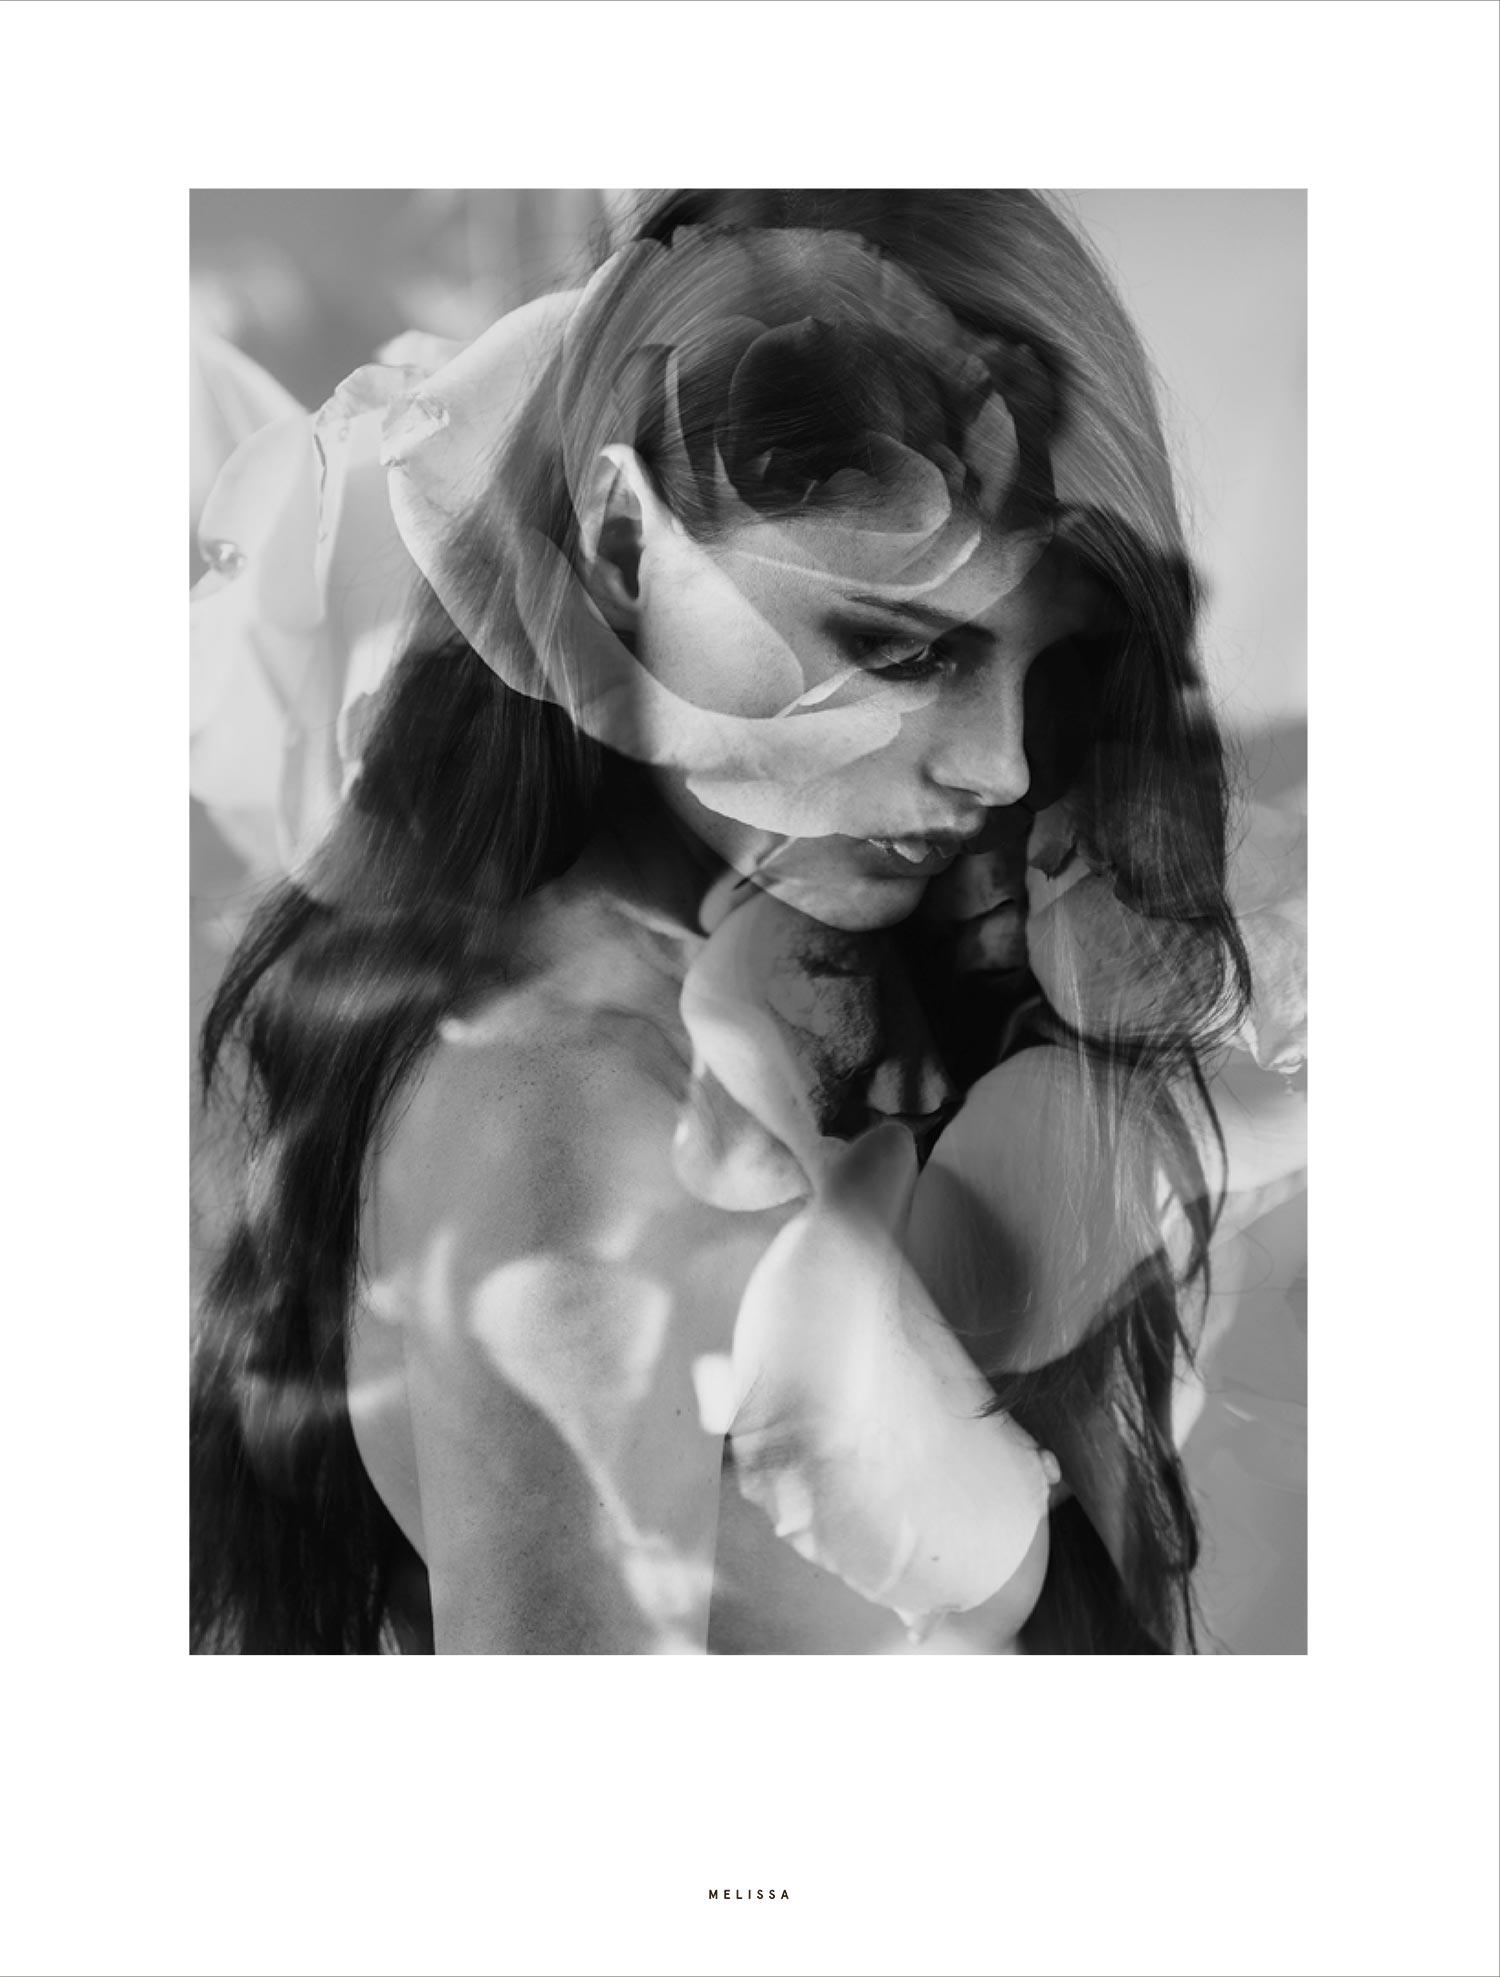 Photographer - Dennis Schoenberg  Stylist - Siobhan Lyons  Hair - Angela Hertel  Makeup Artist - Elizabeth Hsieh  Model - Melissa Bell @ Select